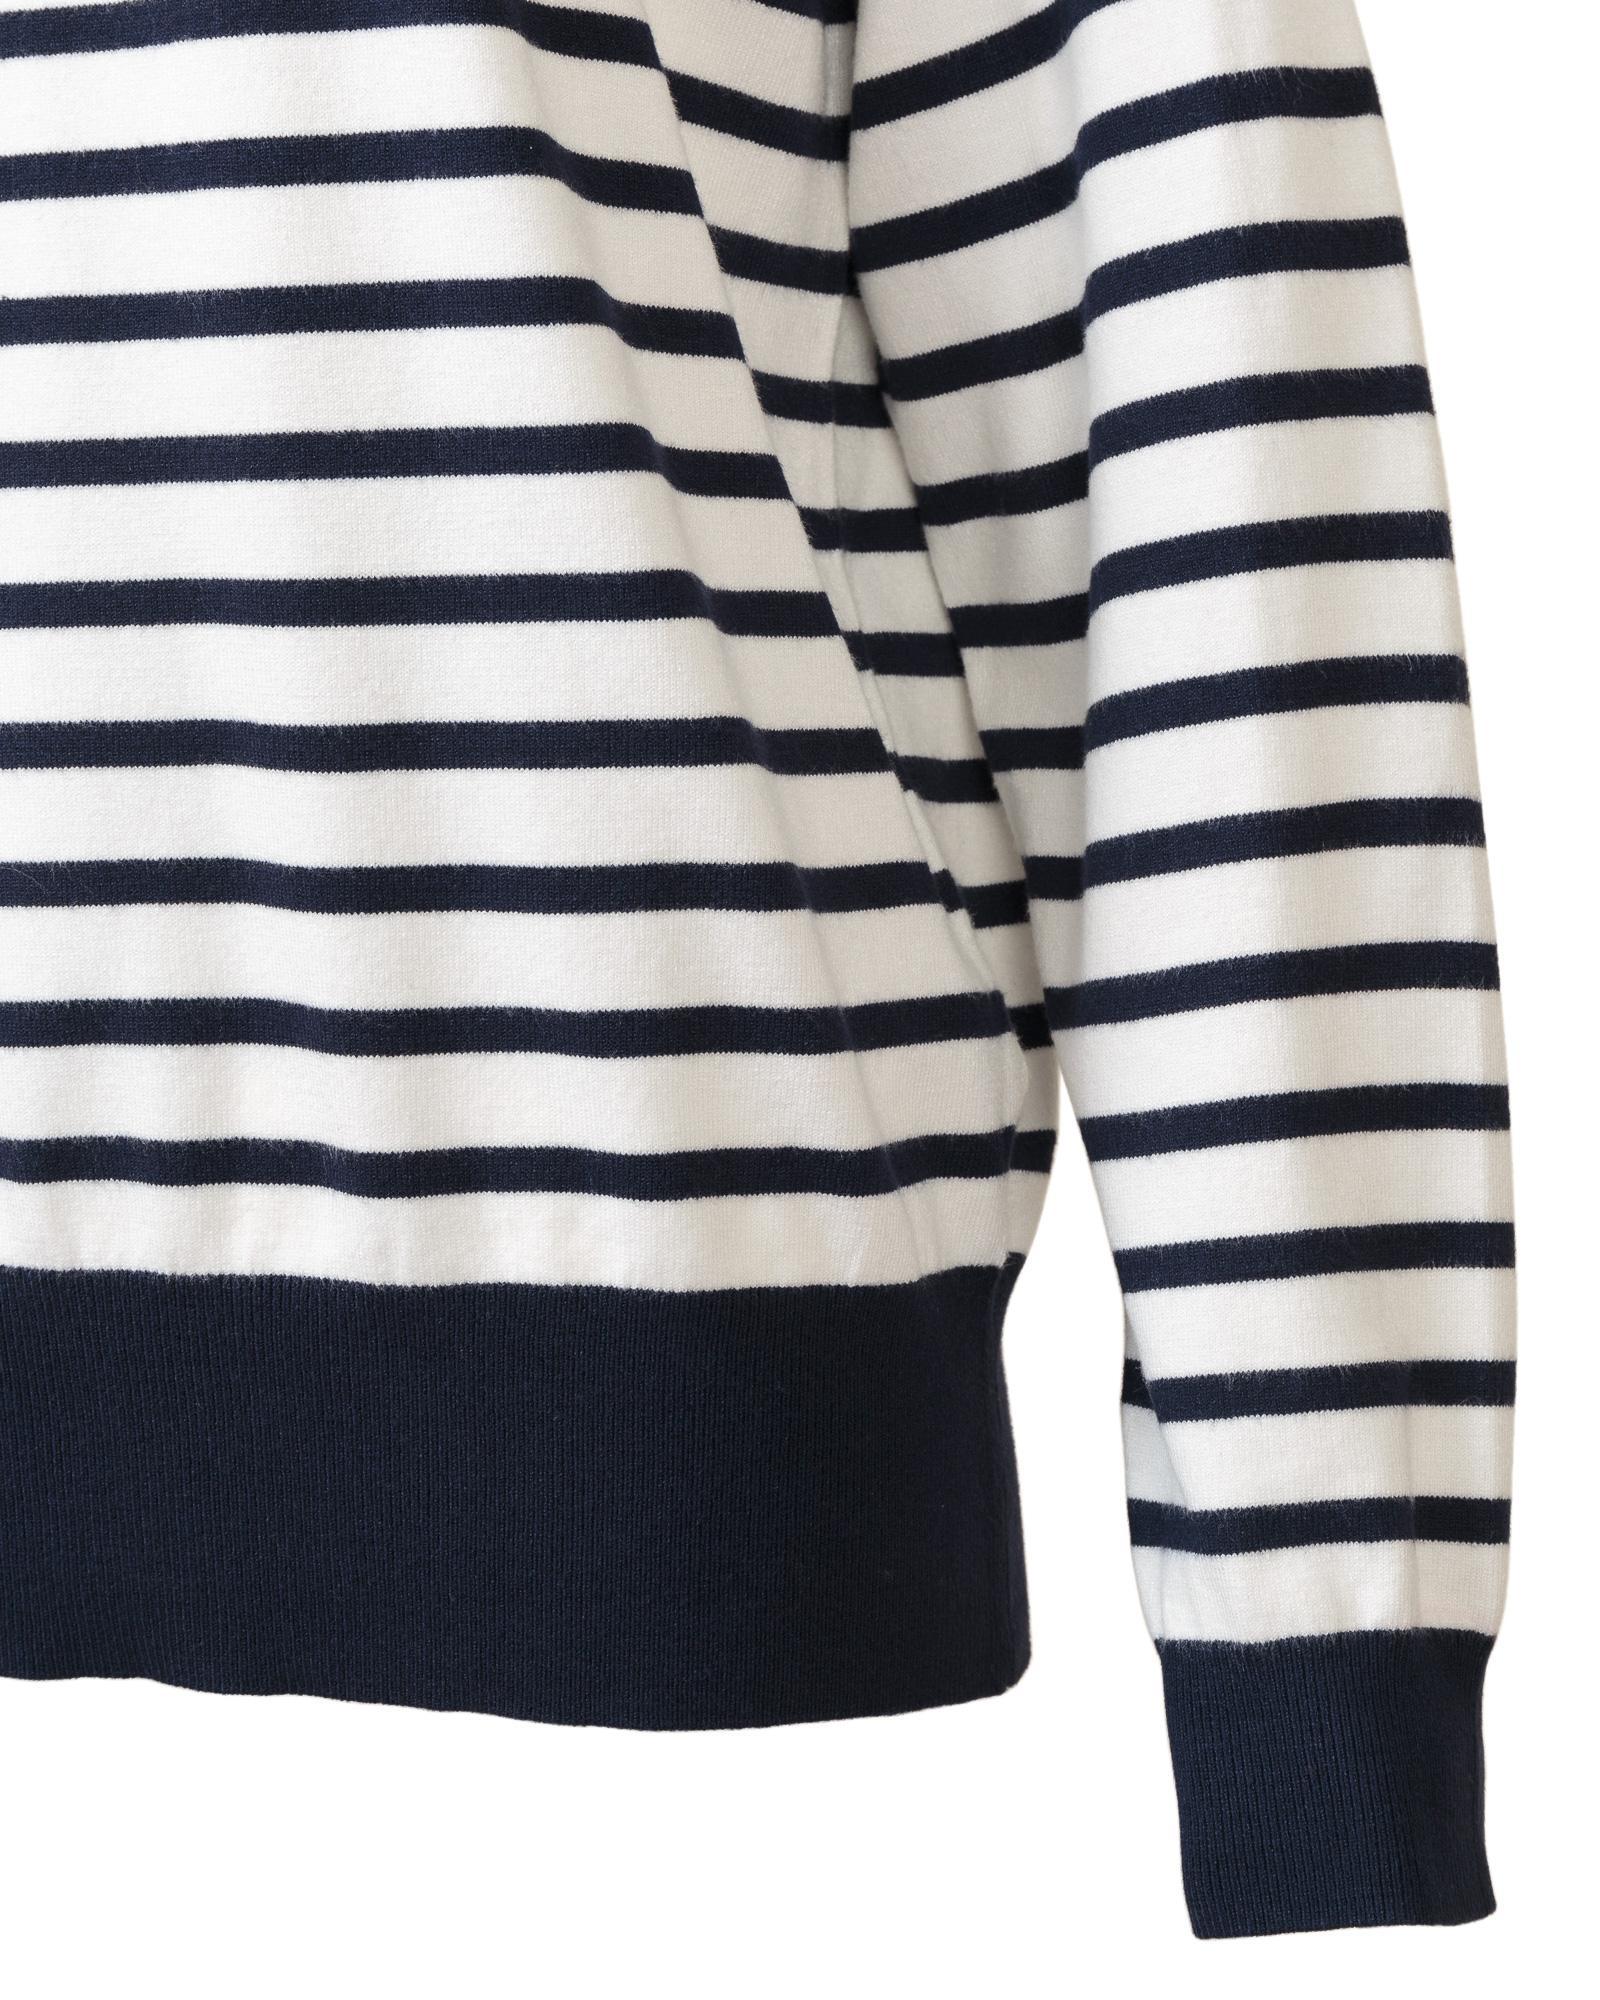 b6563a9b04 Oliver Bonas - Blue Jaimee Breton Navy   White Sweater - Lyst. View  fullscreen